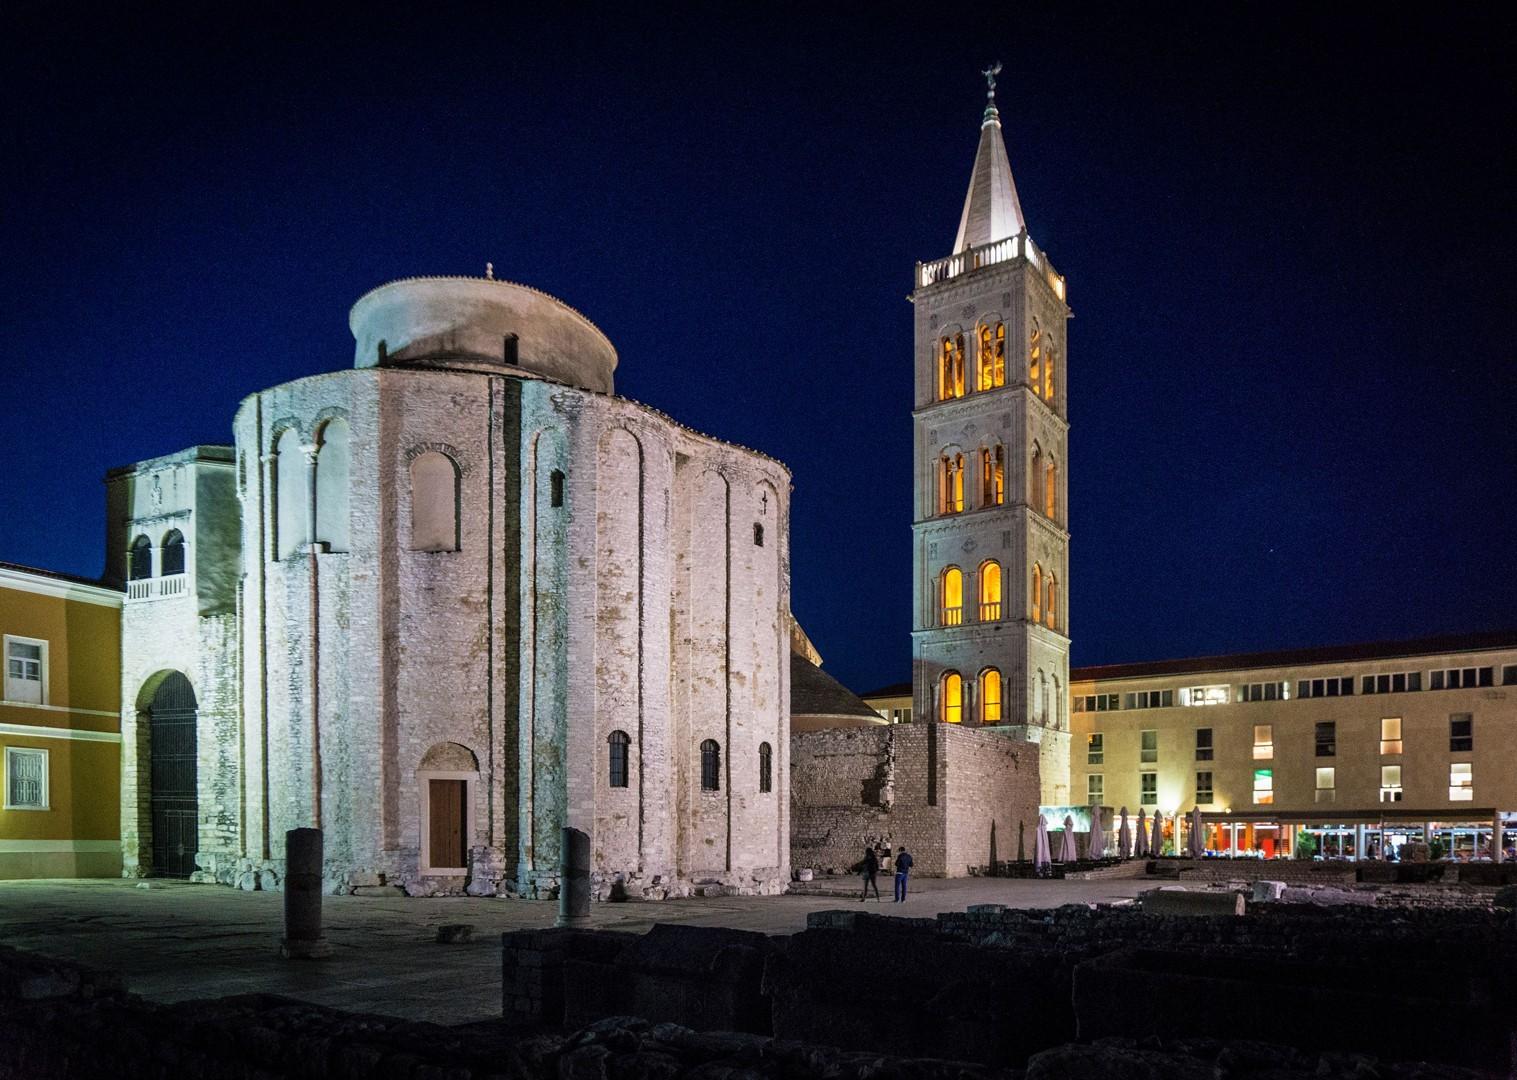 visit-zadar-cycling-holiday-croatia.jpg - Croatia - Dalmatian National Parks and Islands - Bike and Boat Holiday - Leisure Cycling